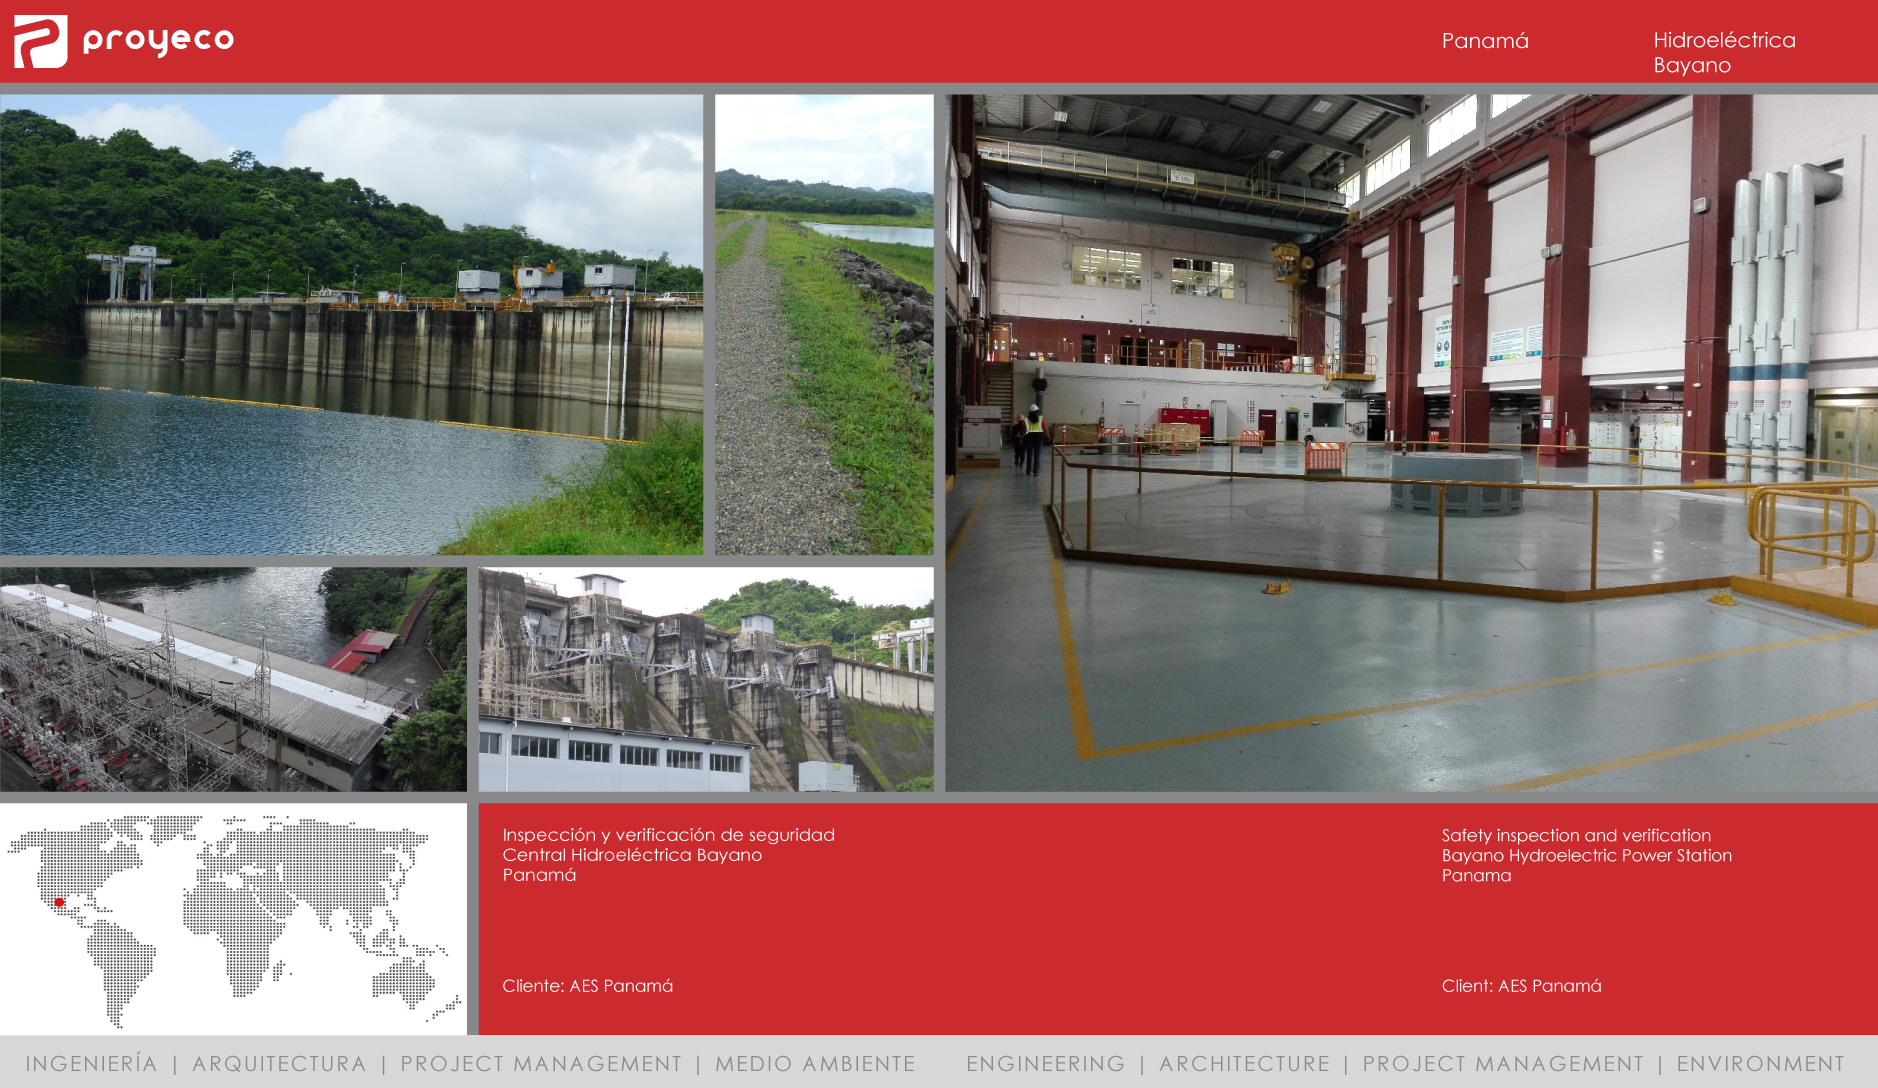 199_Hidroelectrica-Bayano